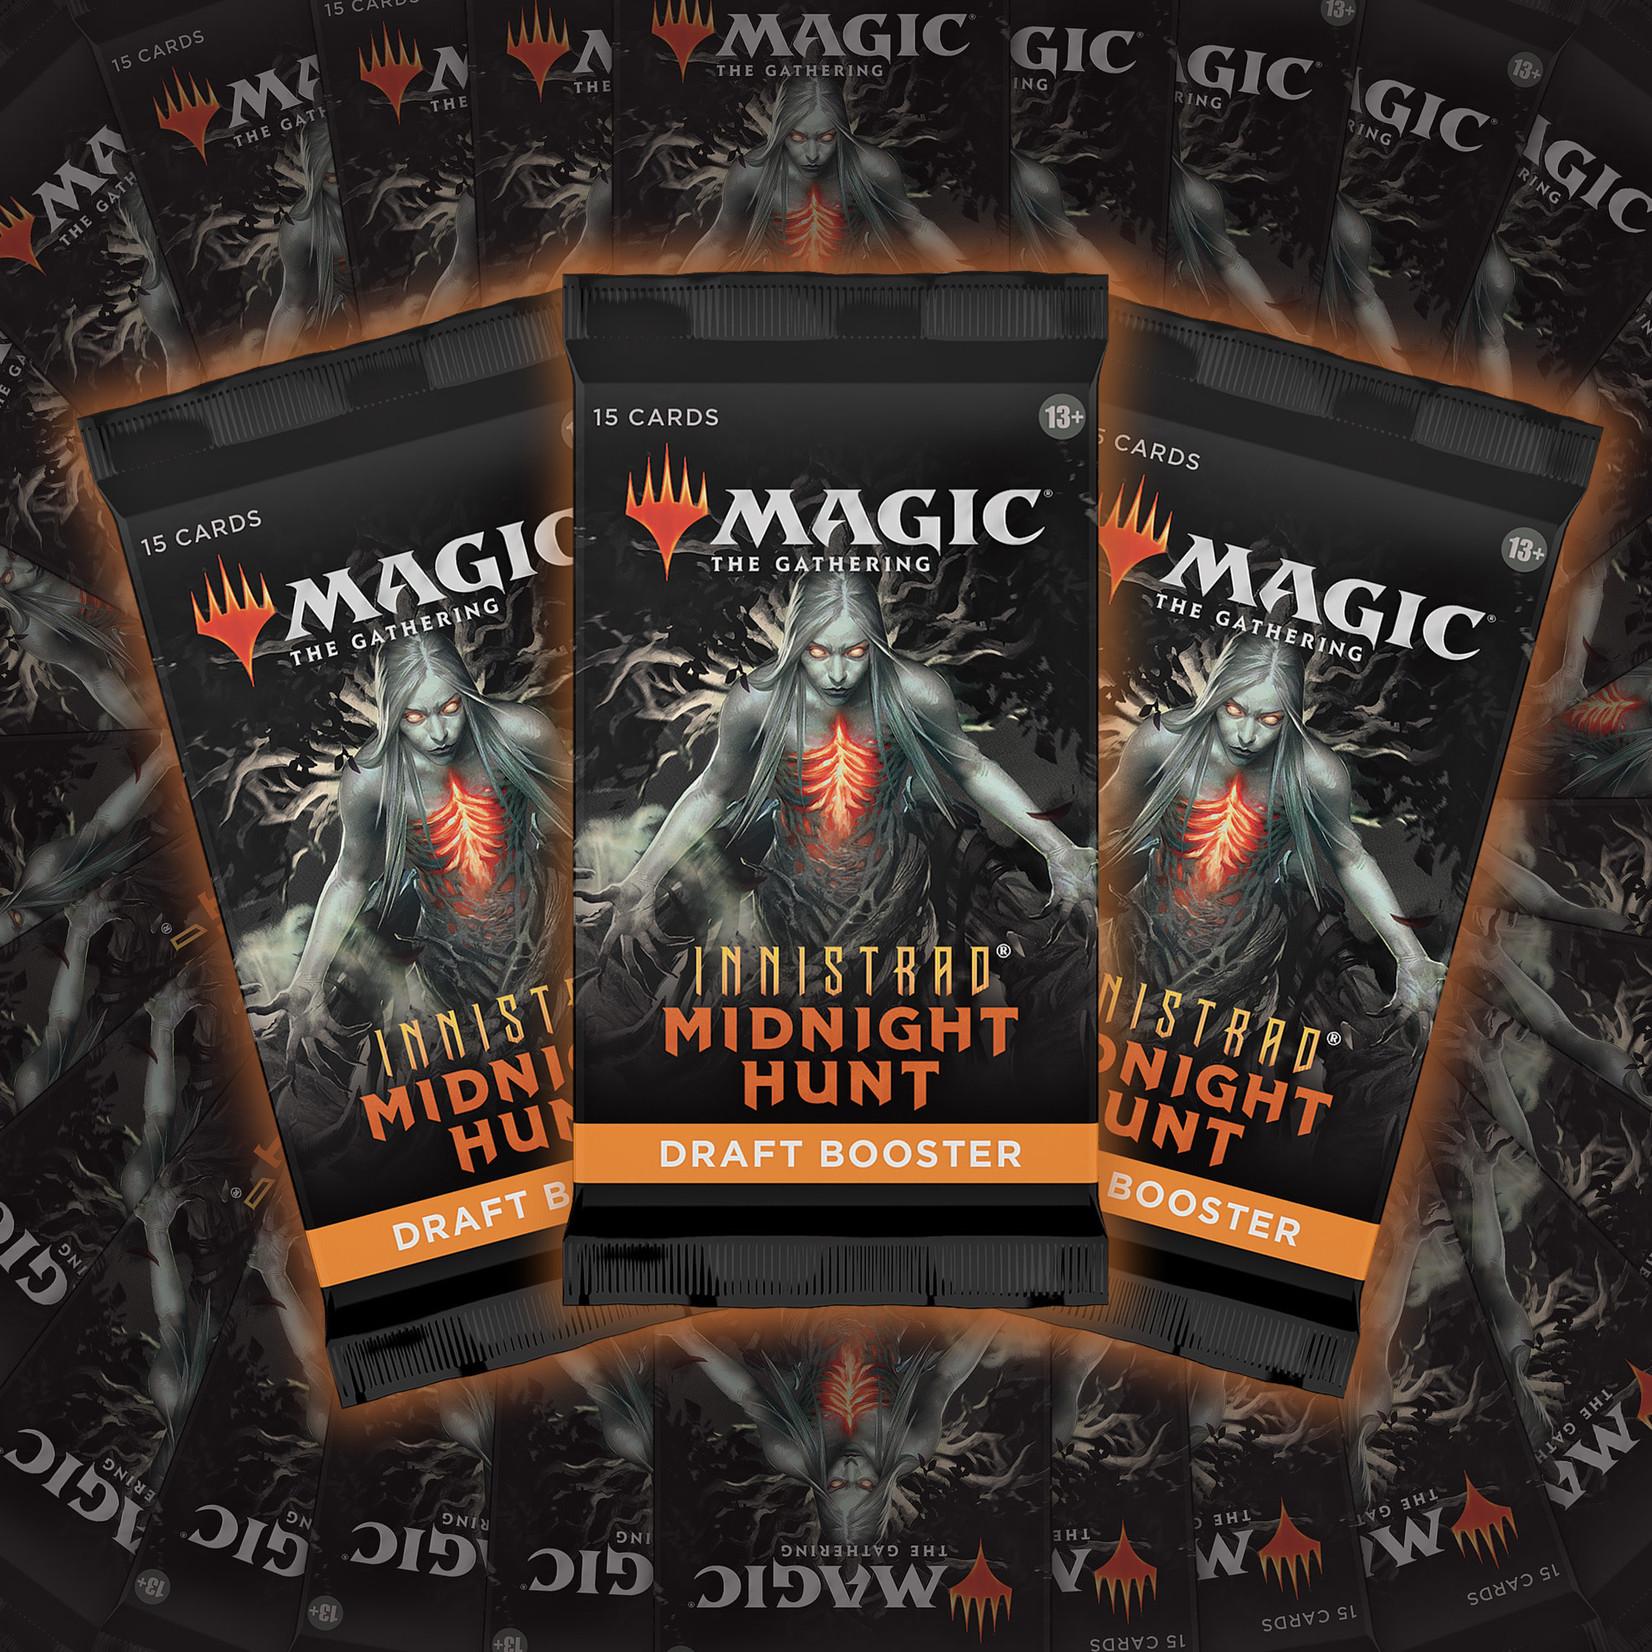 Magic: The Gathering Magic: The Gathering - Innistrad: Midnight Hunt Draft Booster Box